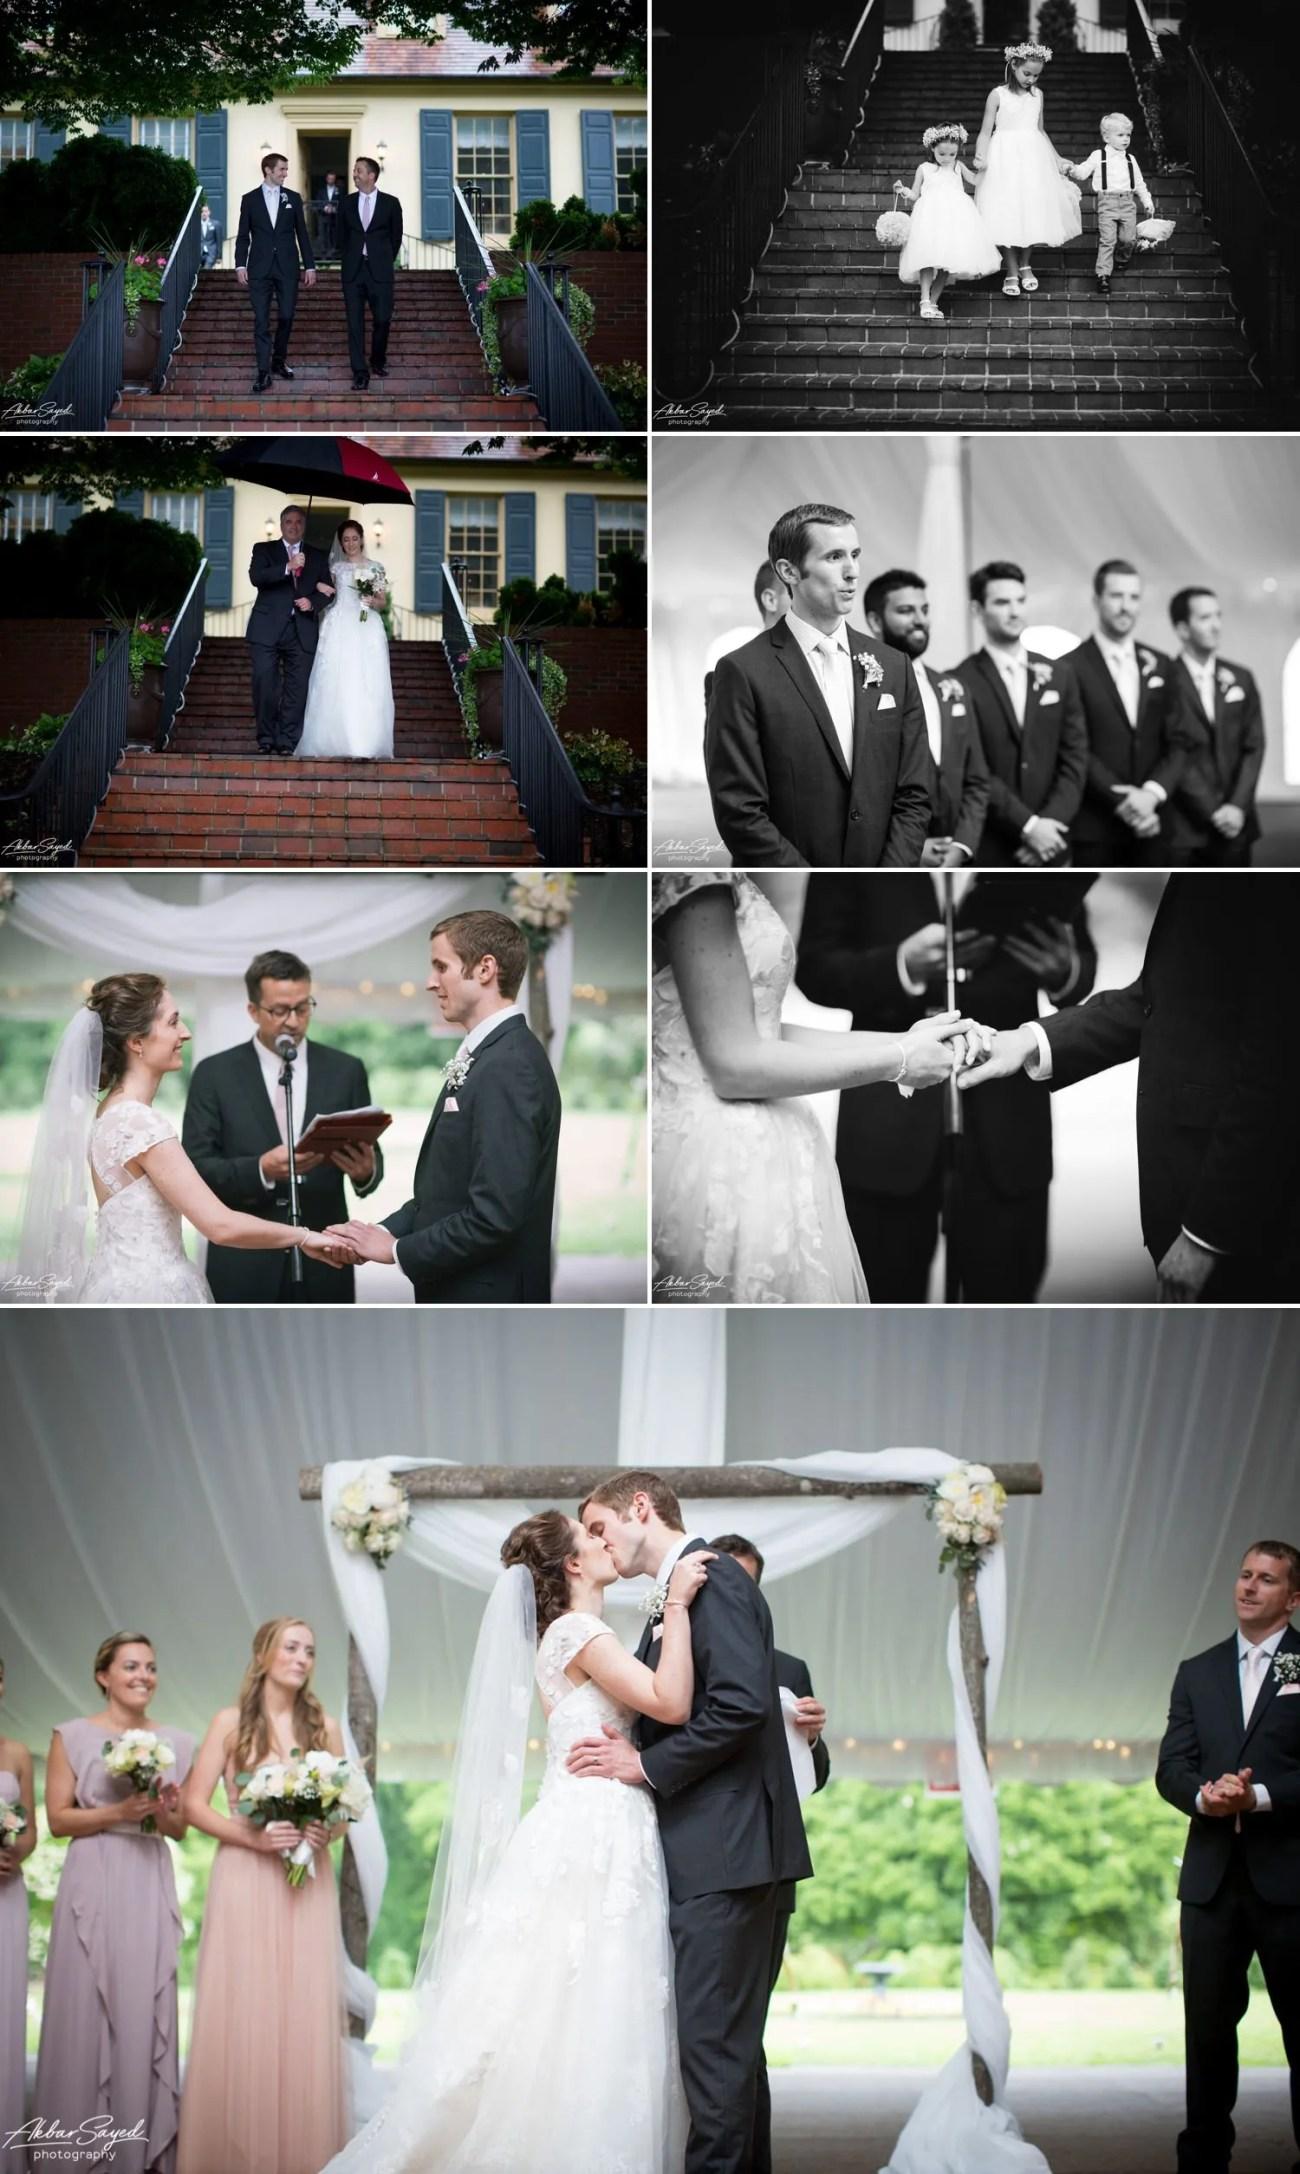 Erica and Jeff - Belmont Manor Wedding 9